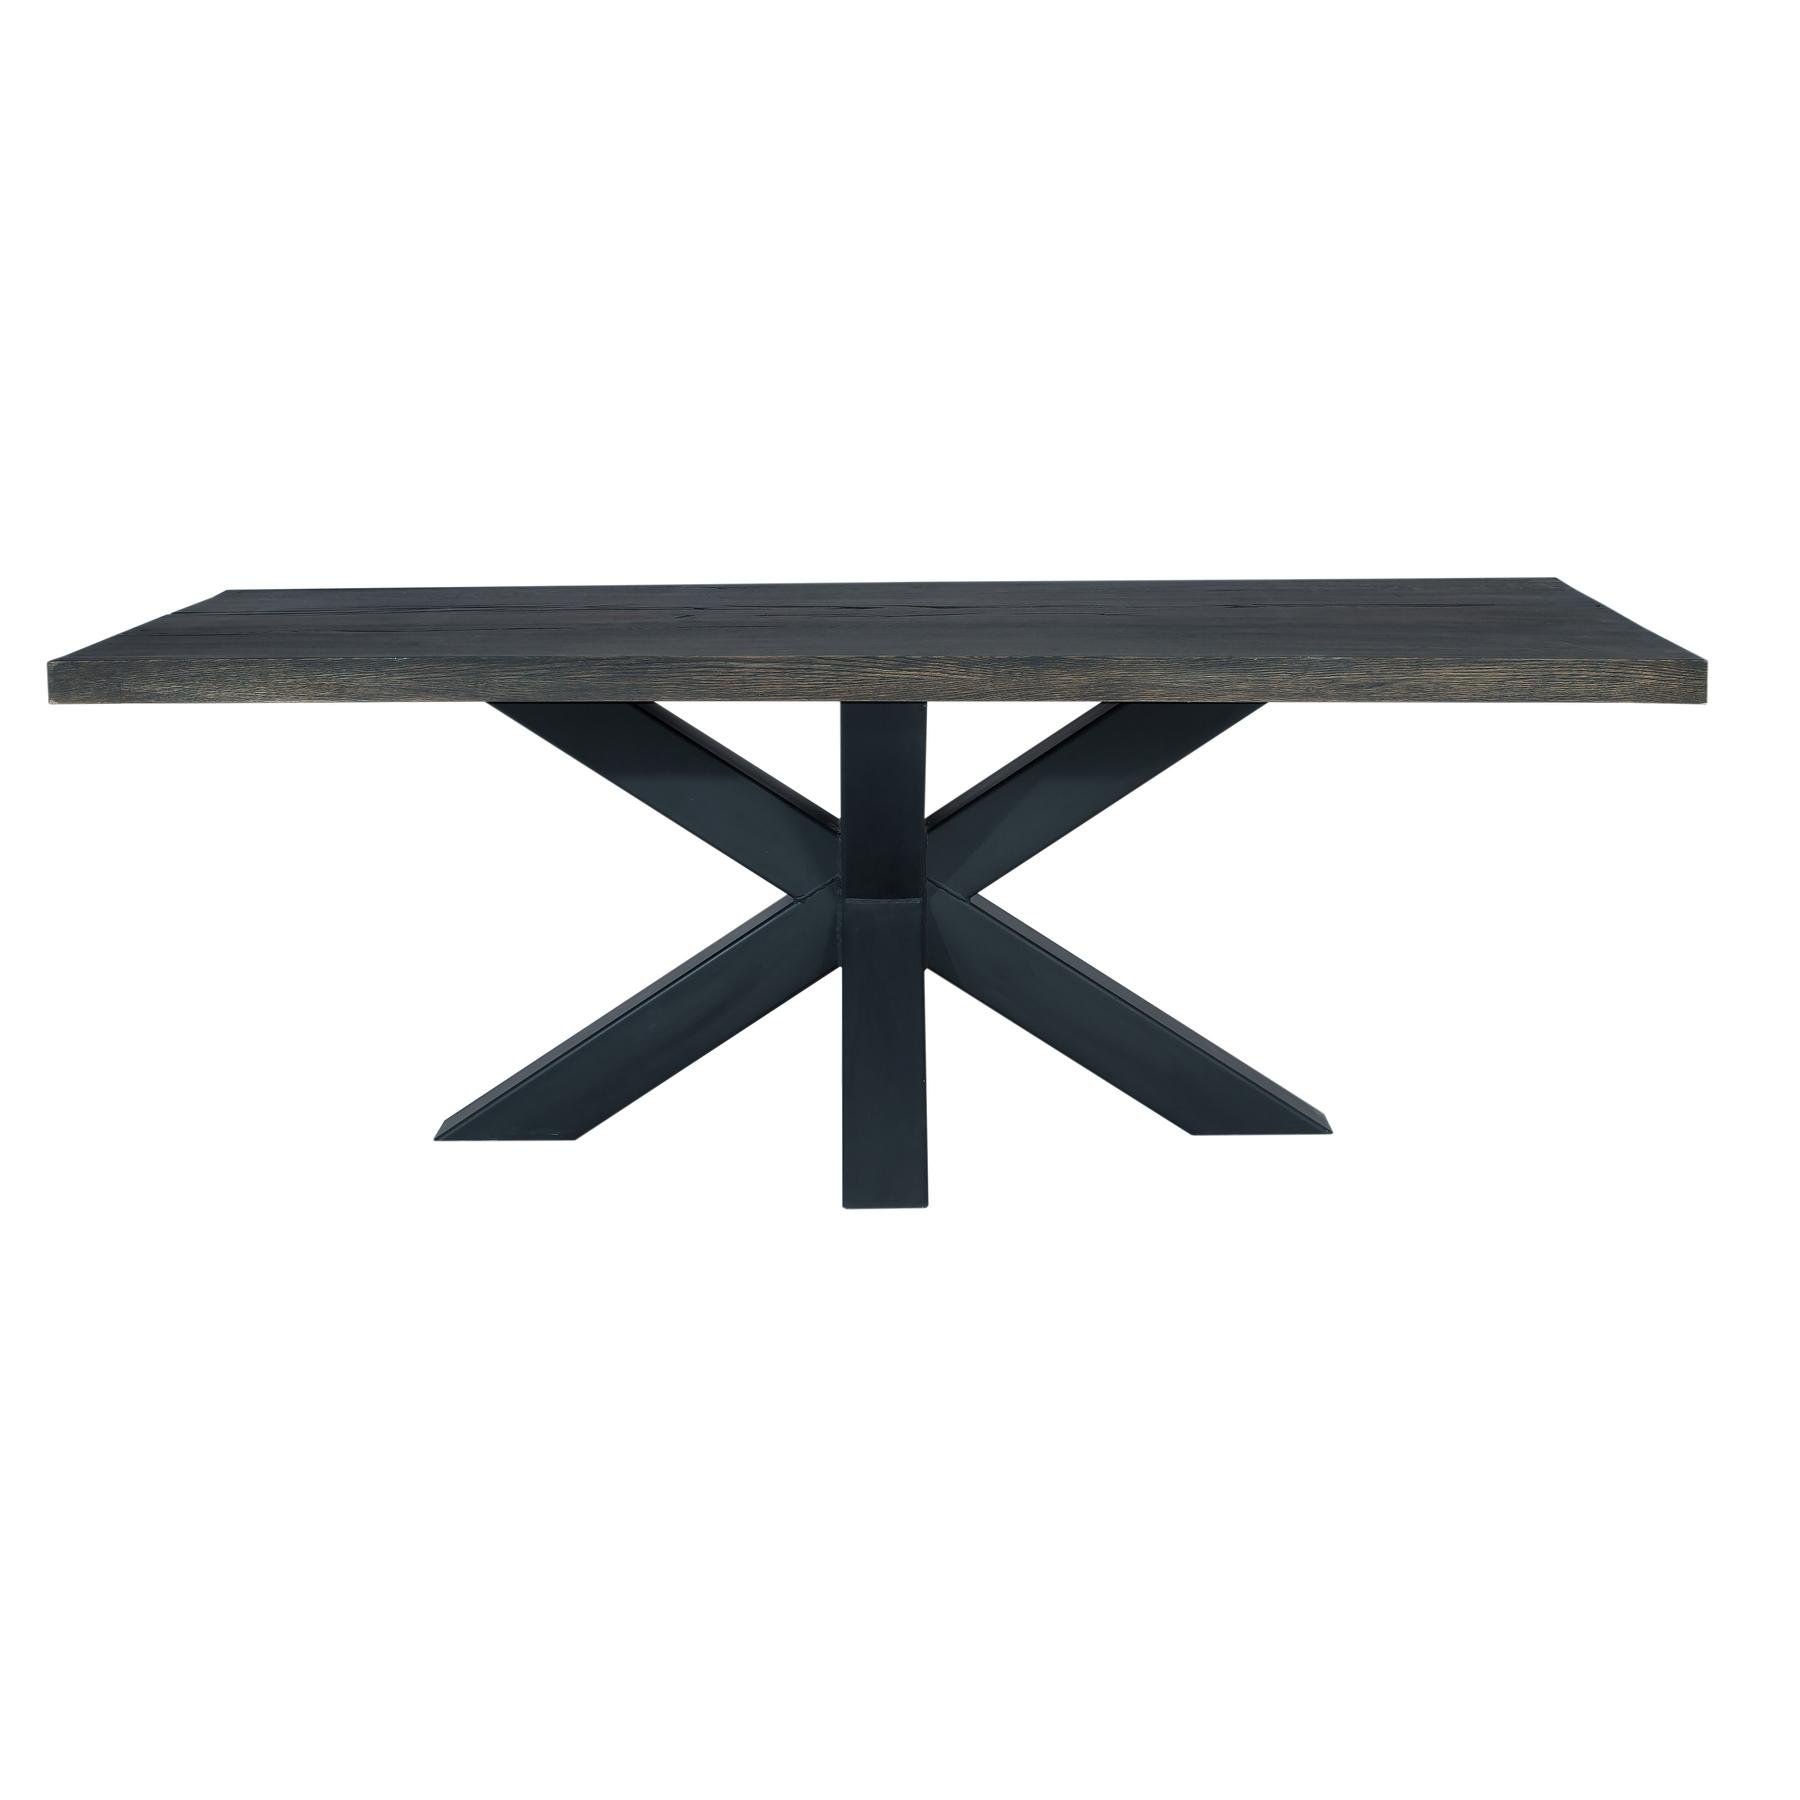 Masa din lemn de stejar salbatic cu picioare metalice Chicago I L240xl100xH76 cm